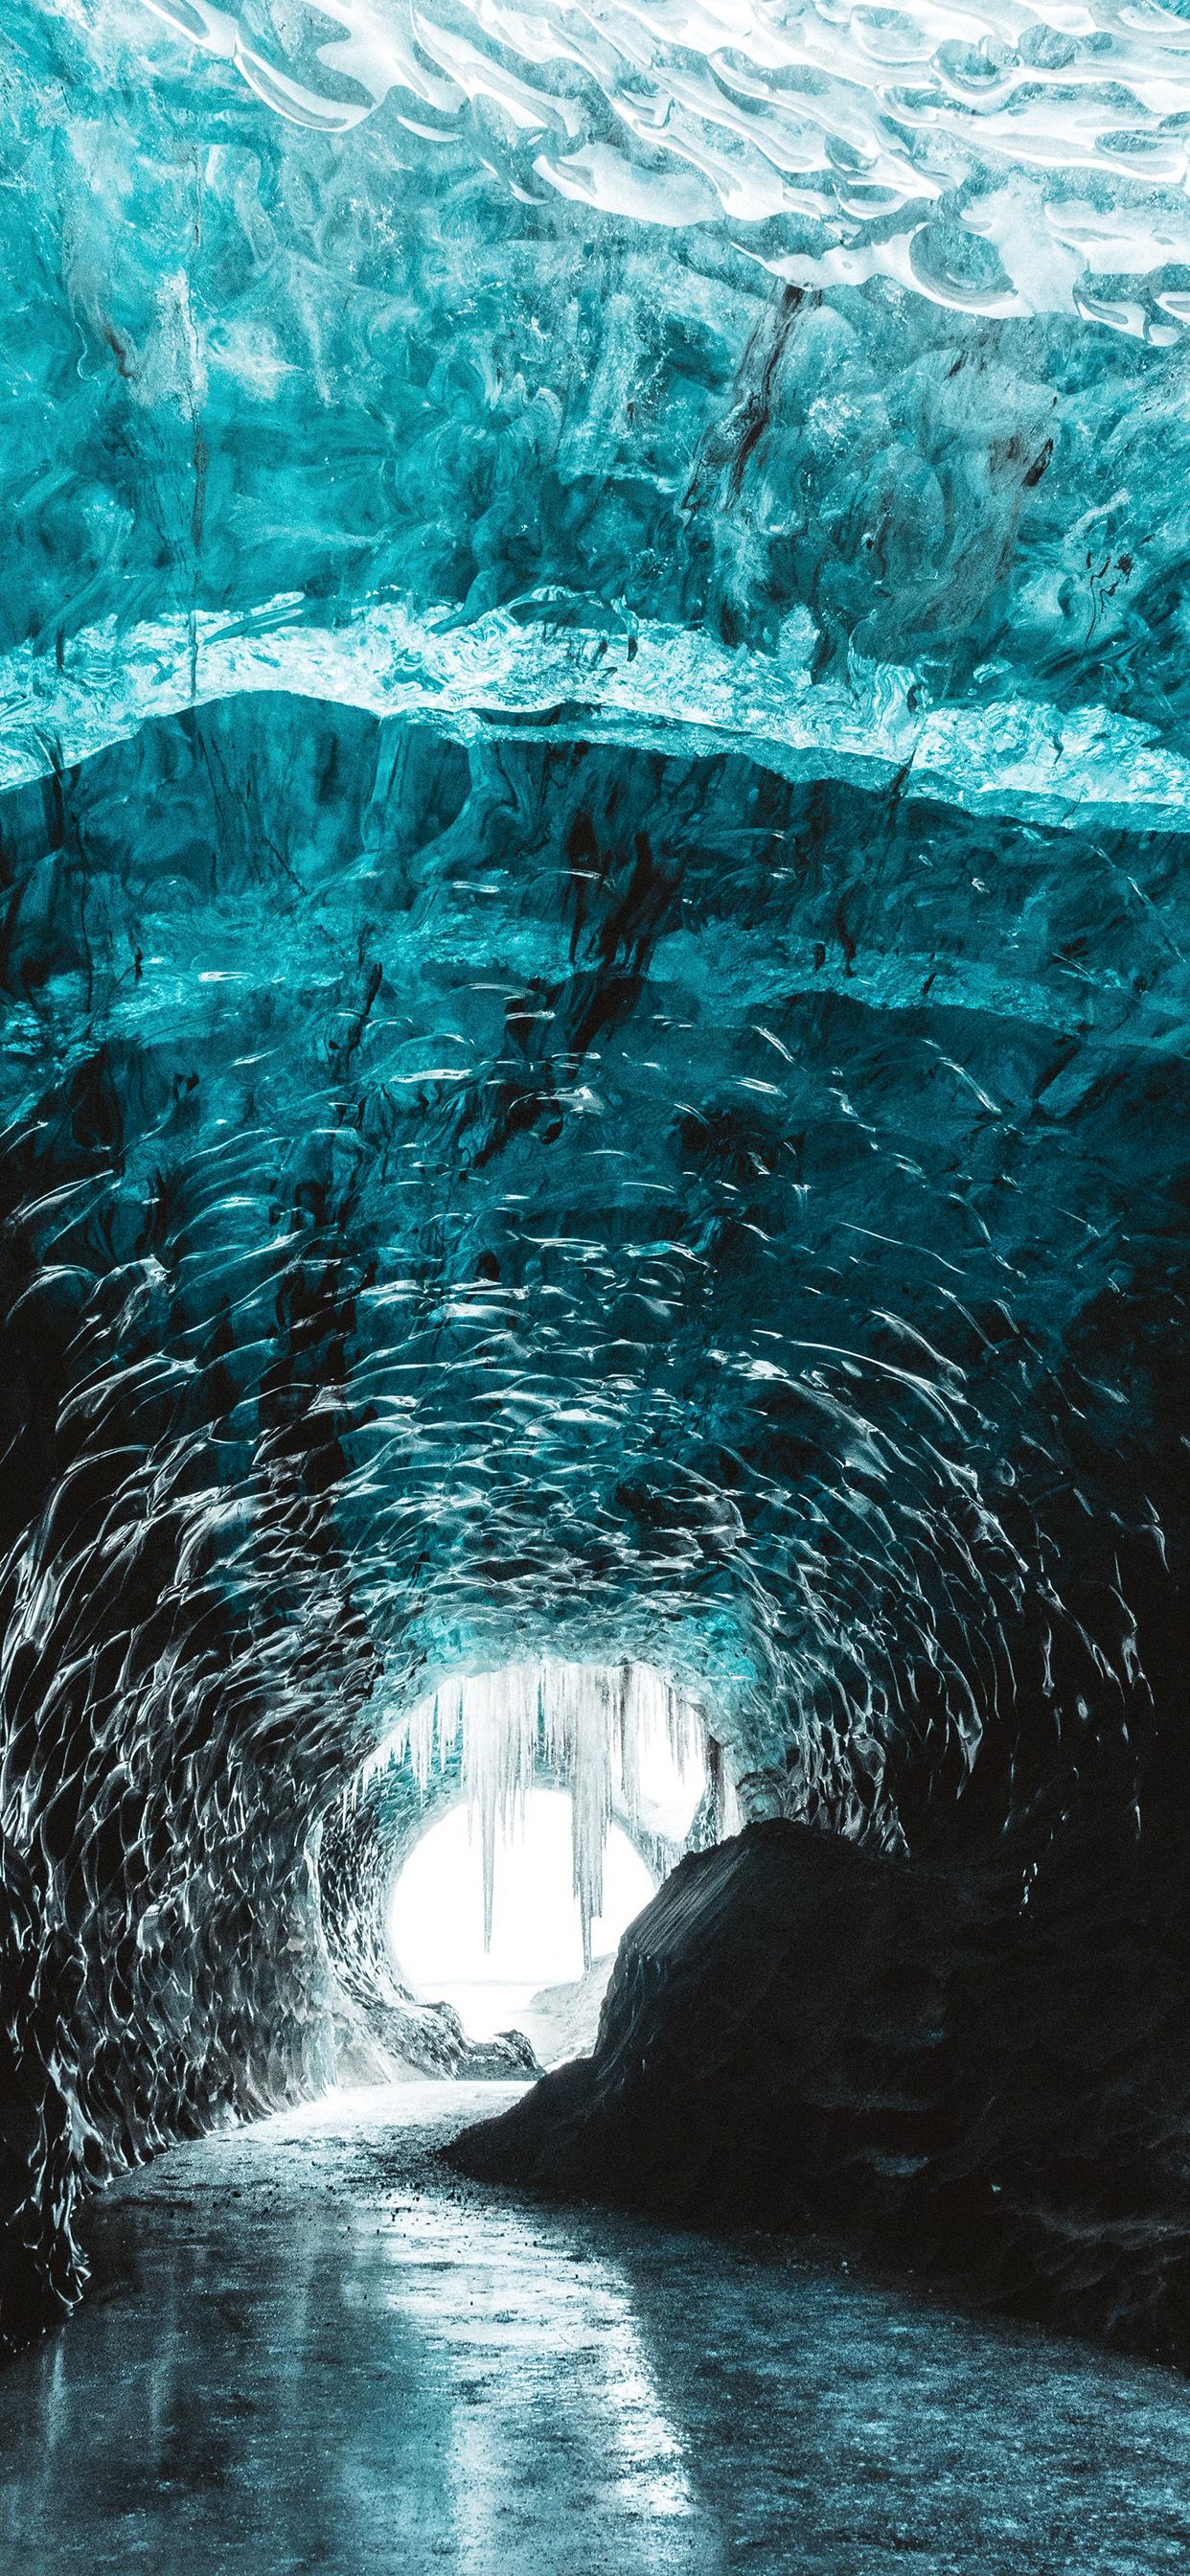 iPhone wallpapers cave glacier jokulsarlon Fonds d'écran iPhone du 22/05/2019